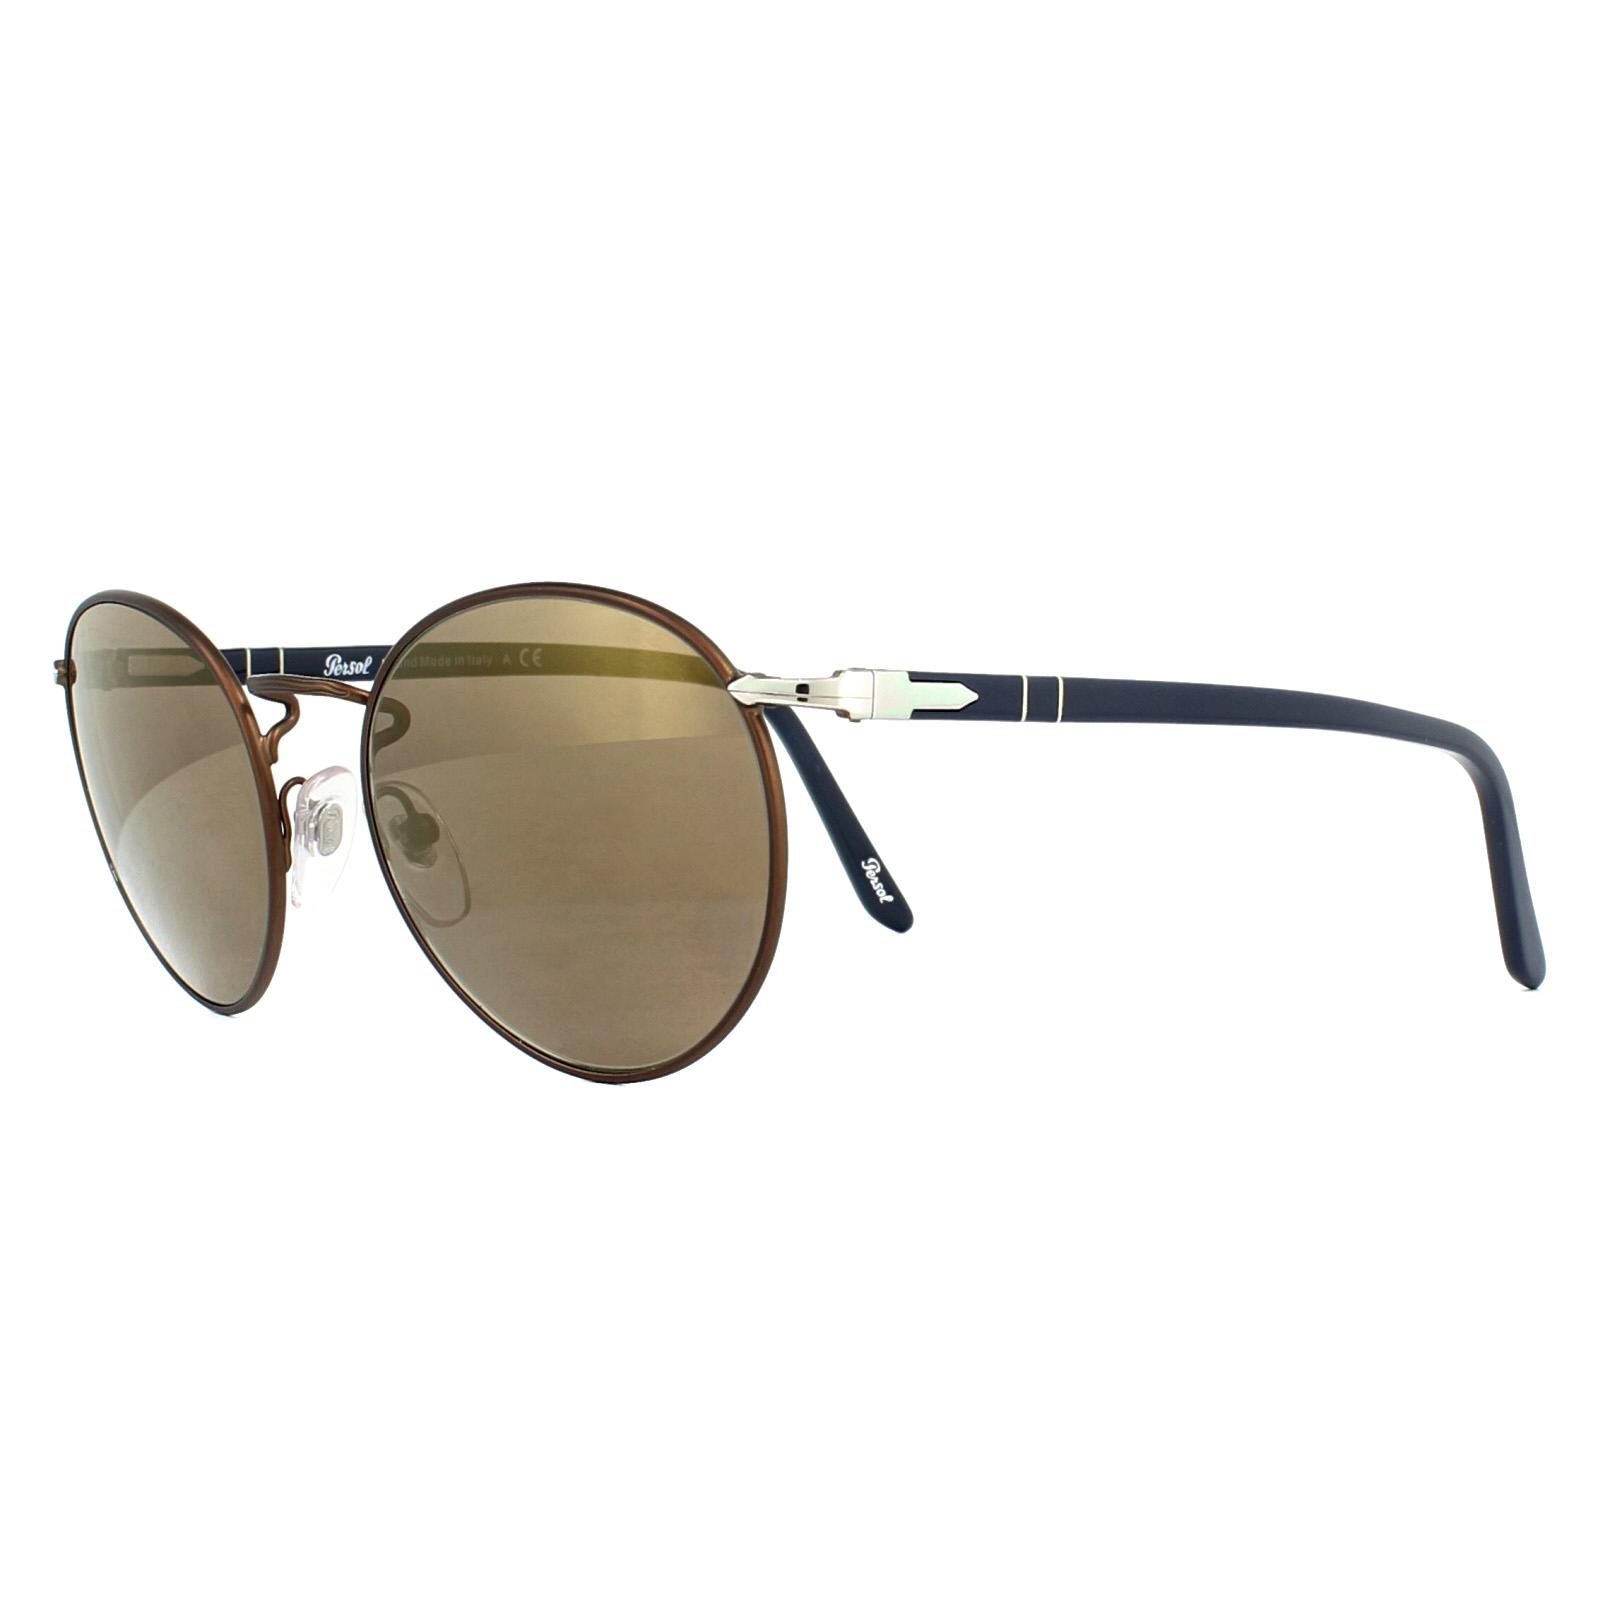 16ac41fdf7a Sentinel Persol Sunglasses 2388S 1066O3 Brown Brown Gold Mirror